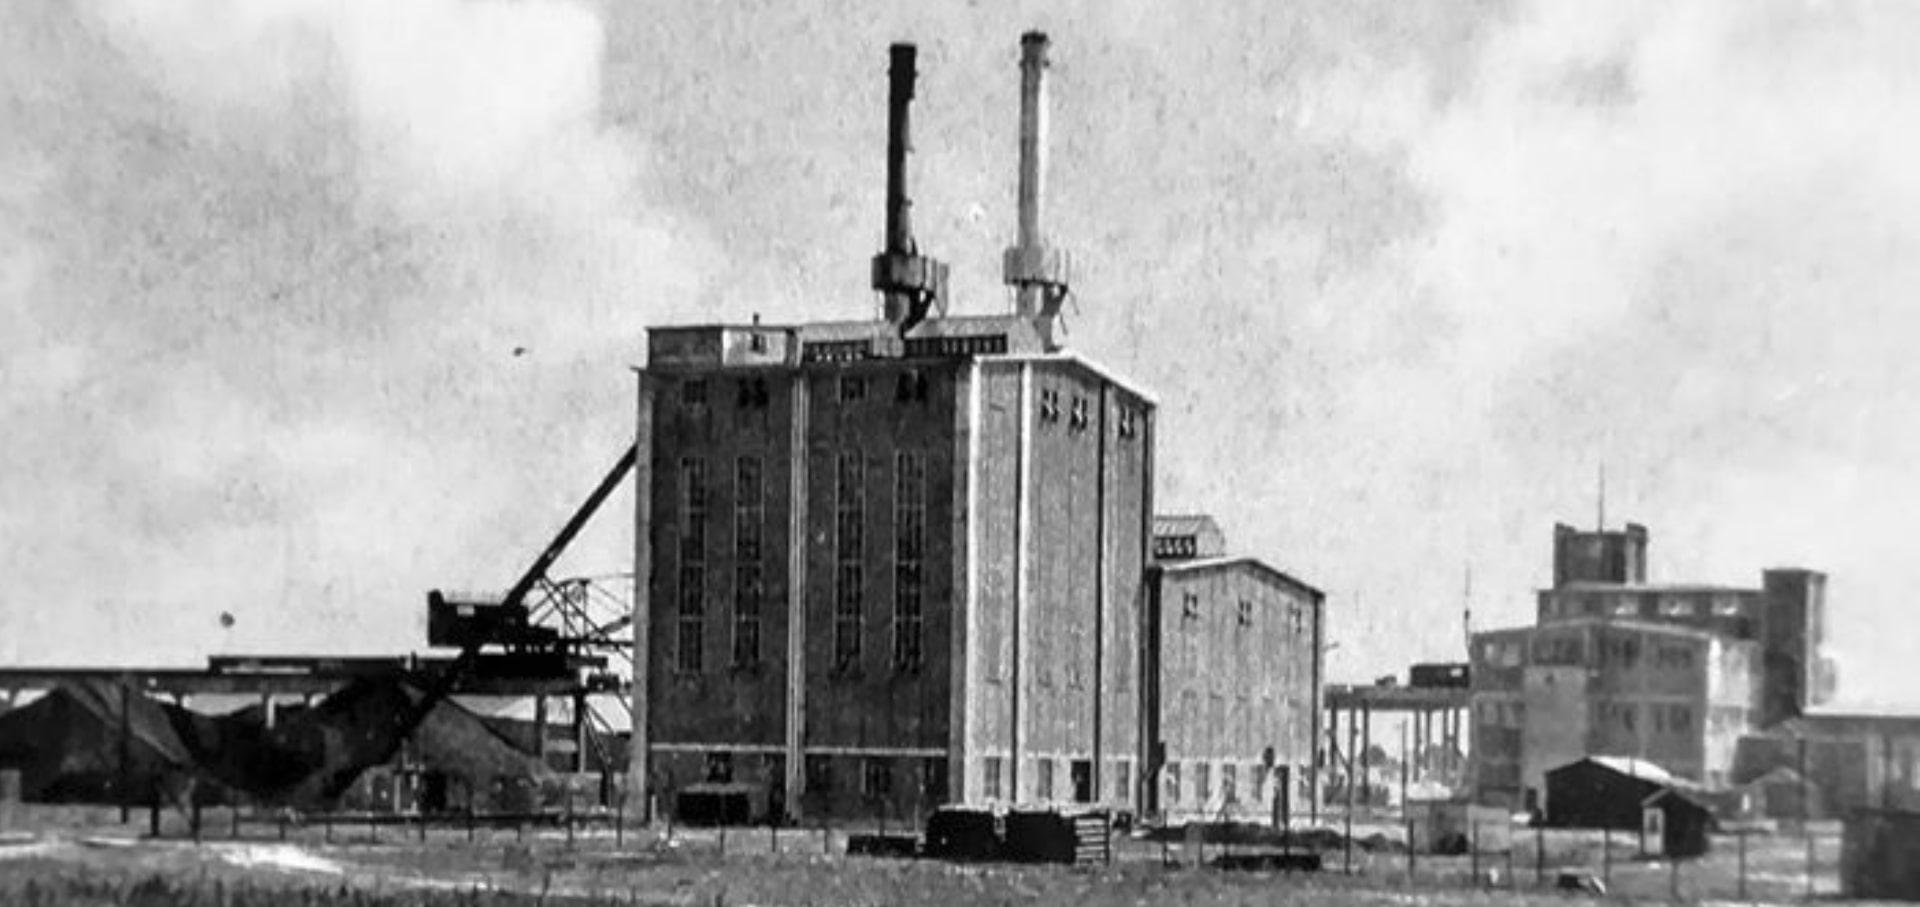 Ny Magle Mølle Papirfabrik 1938